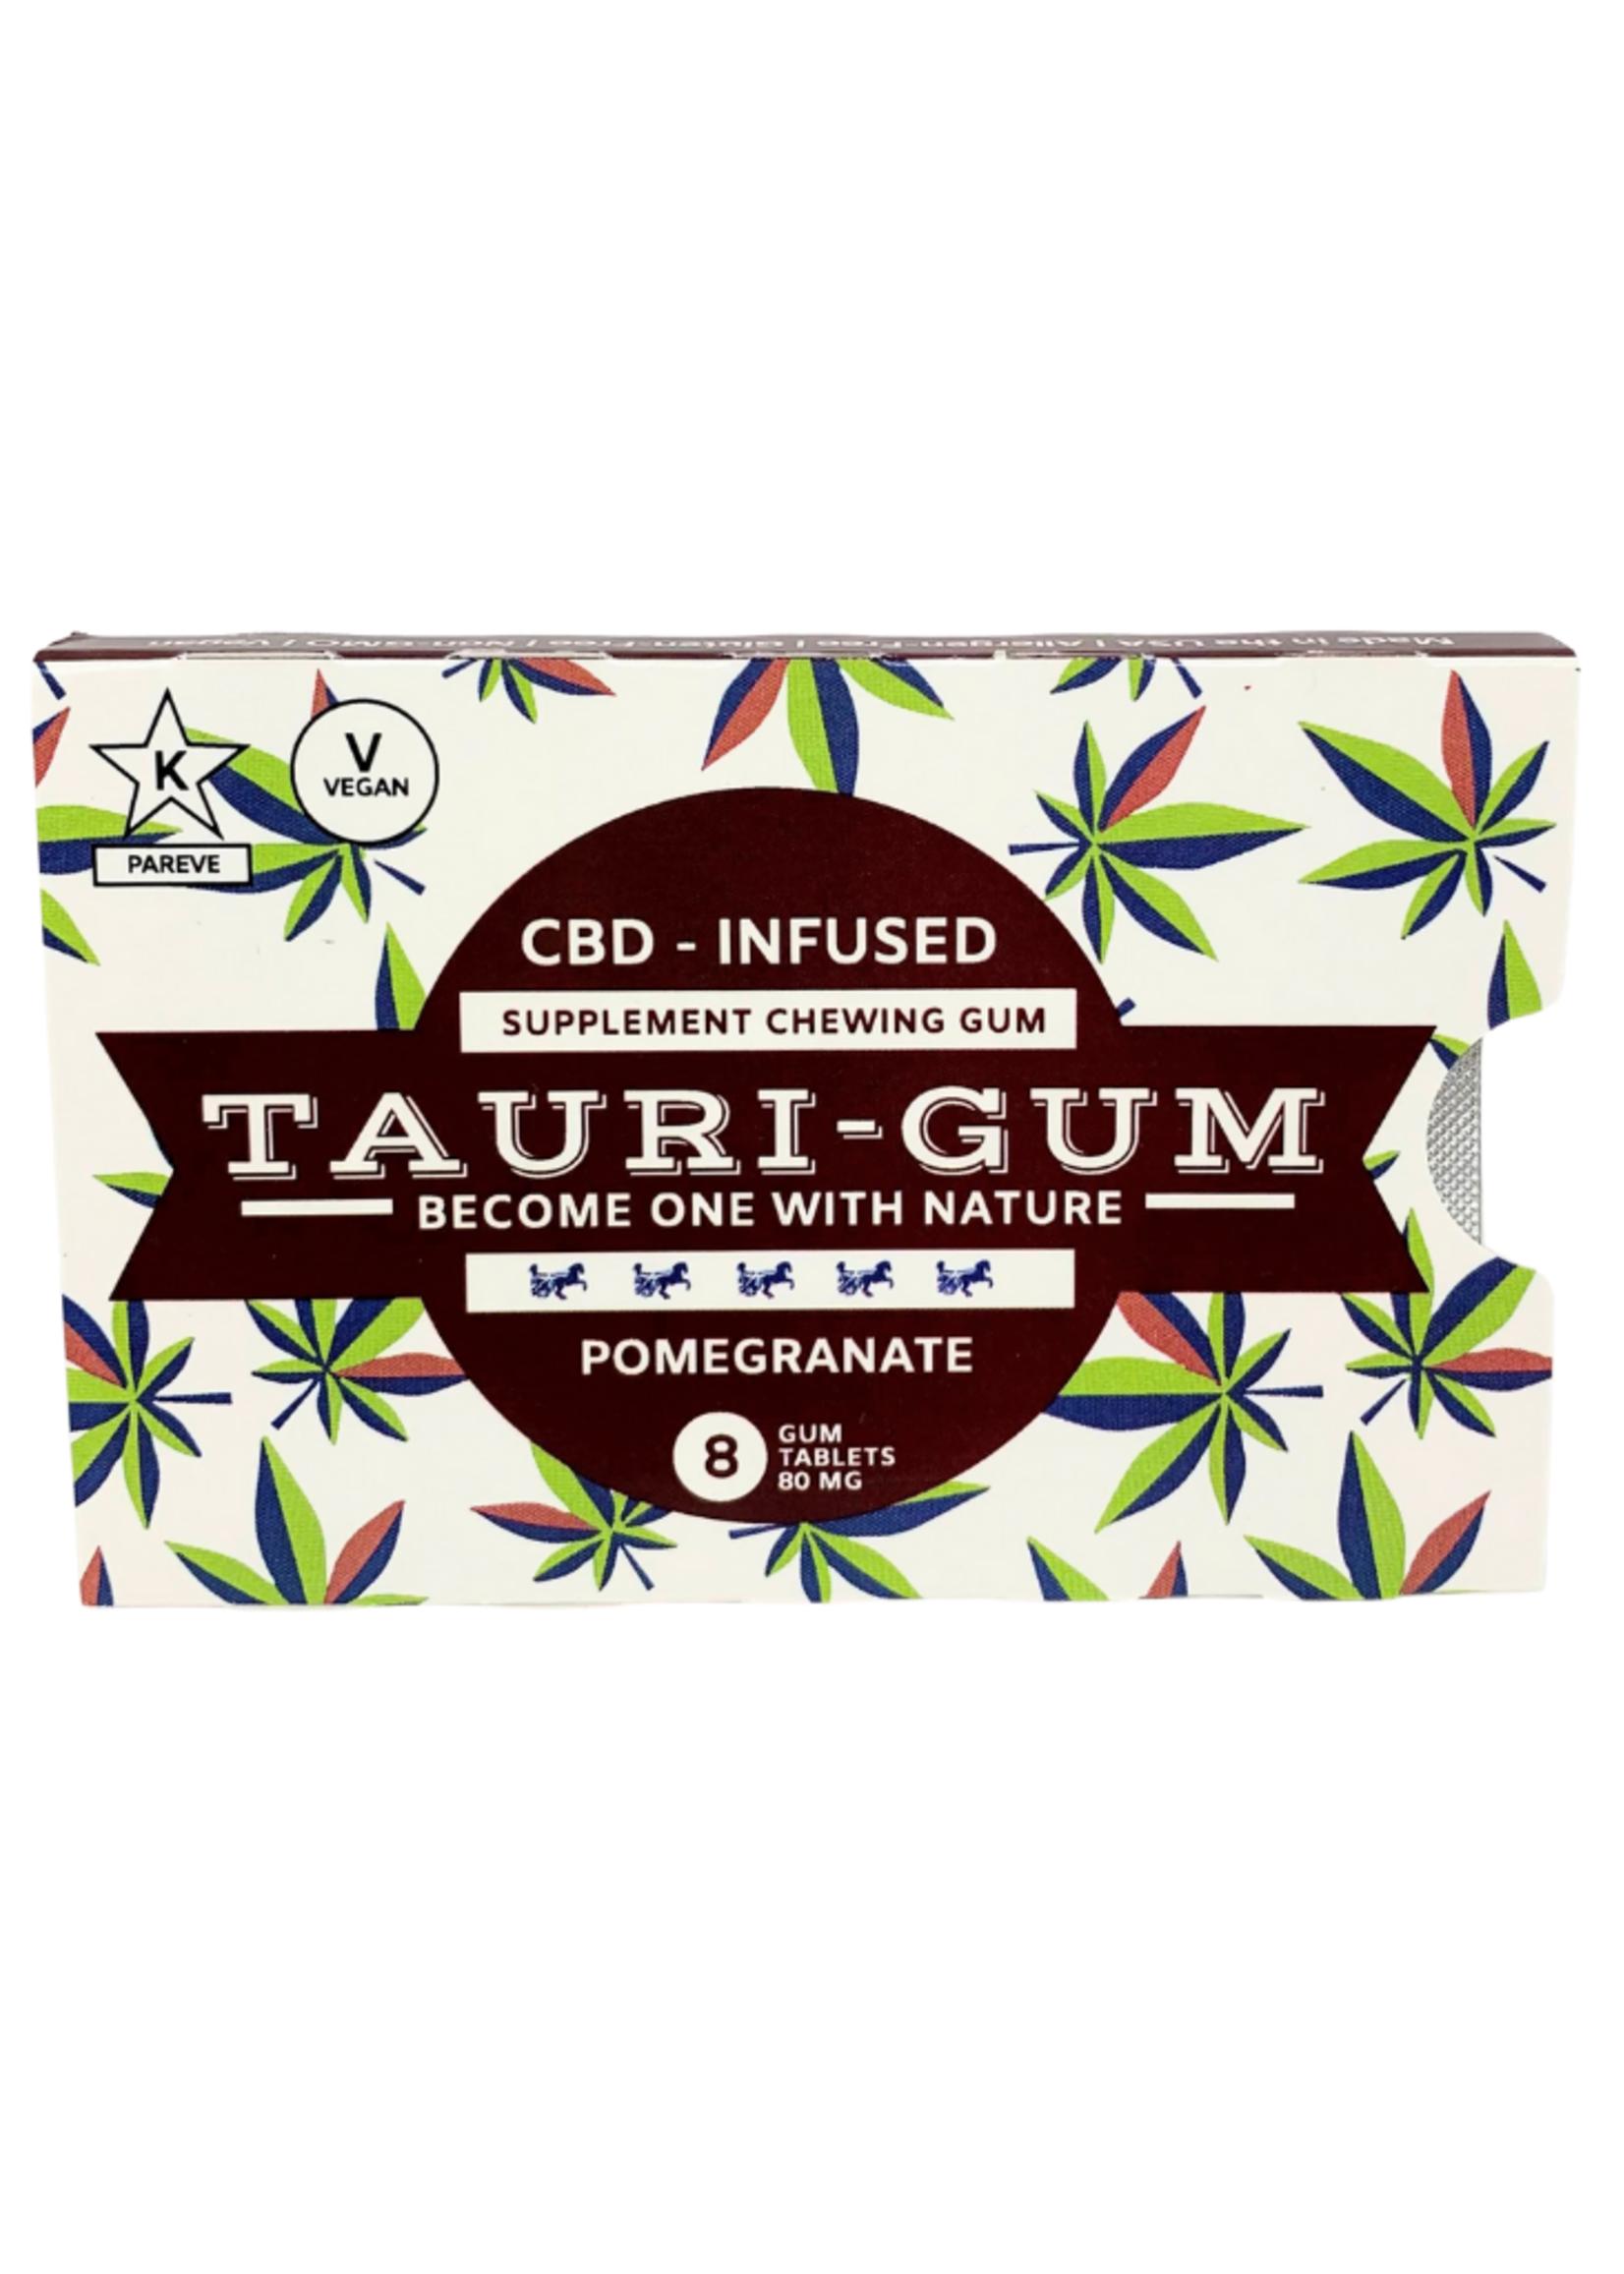 Tauri Gum CBD Infused Supplement Pomegranate Flavor